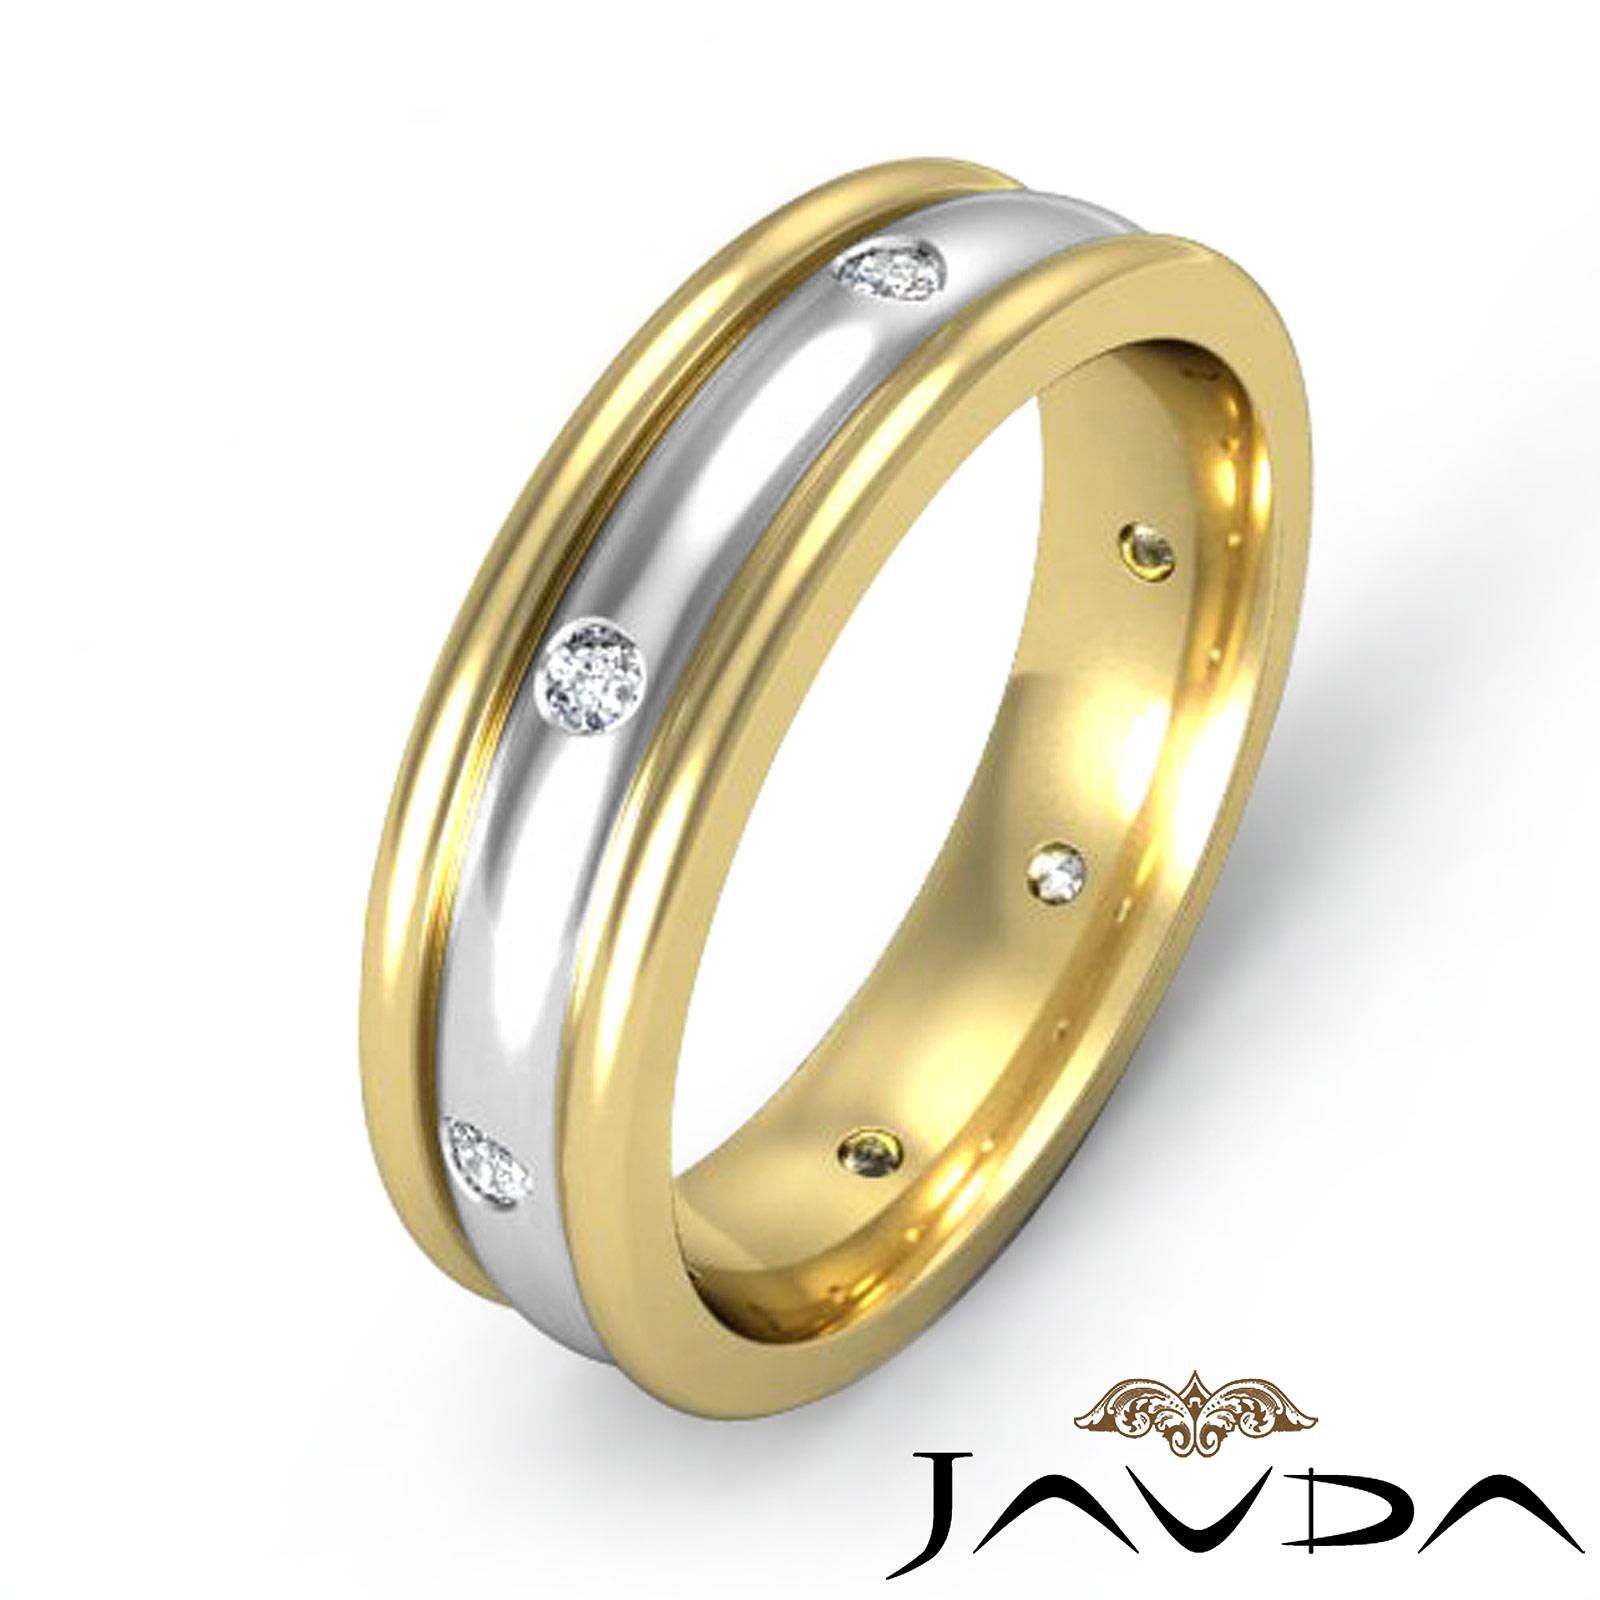 Mens Bezel Round Diamond Solid Ring Eternity Wedding Band 18k 2Tone Gold 016Ct Tw